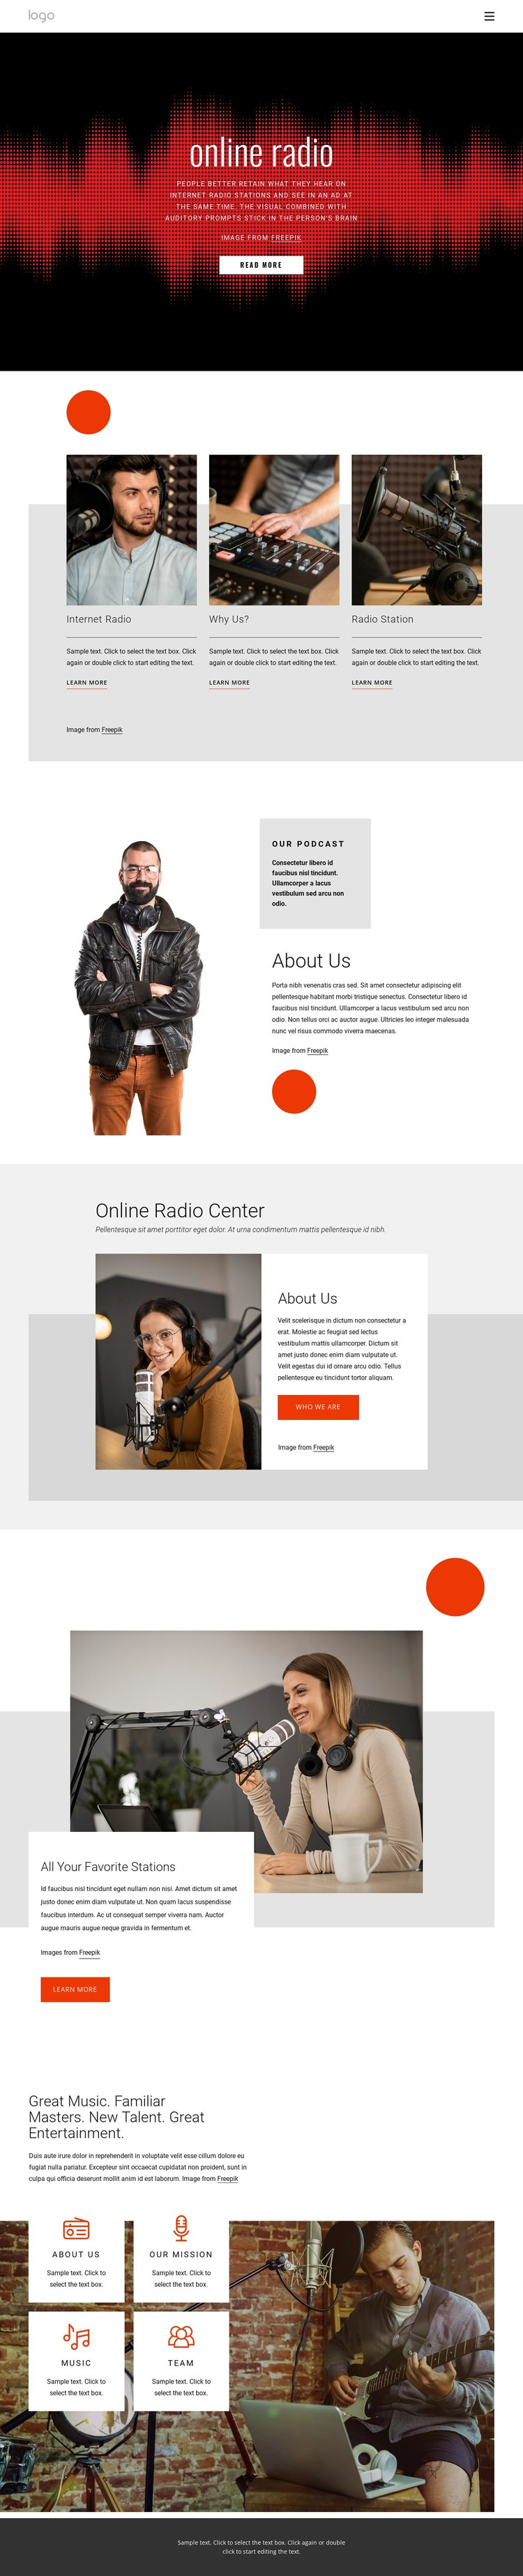 Online radio shows Web Page Designer